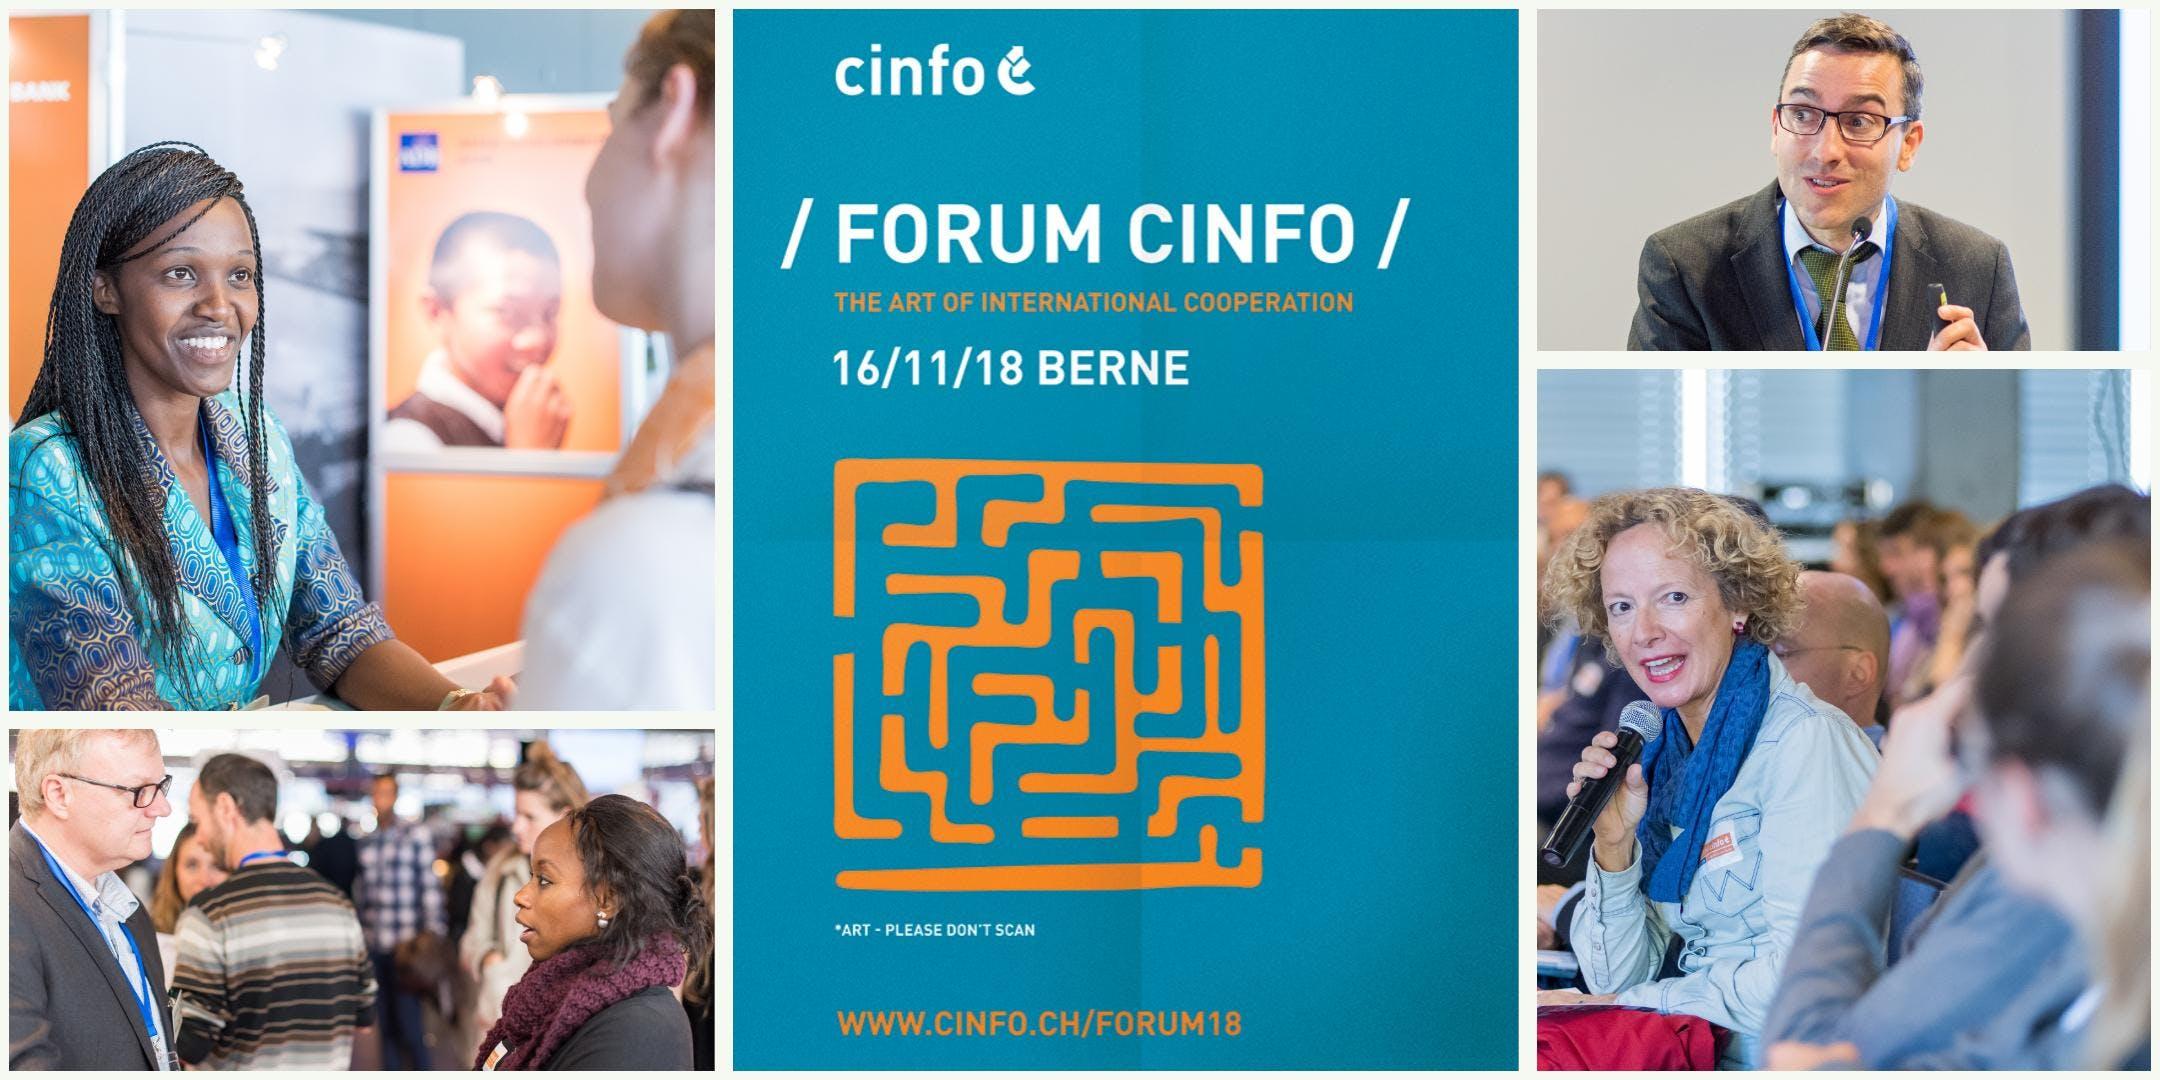 Forum cinfo 2018